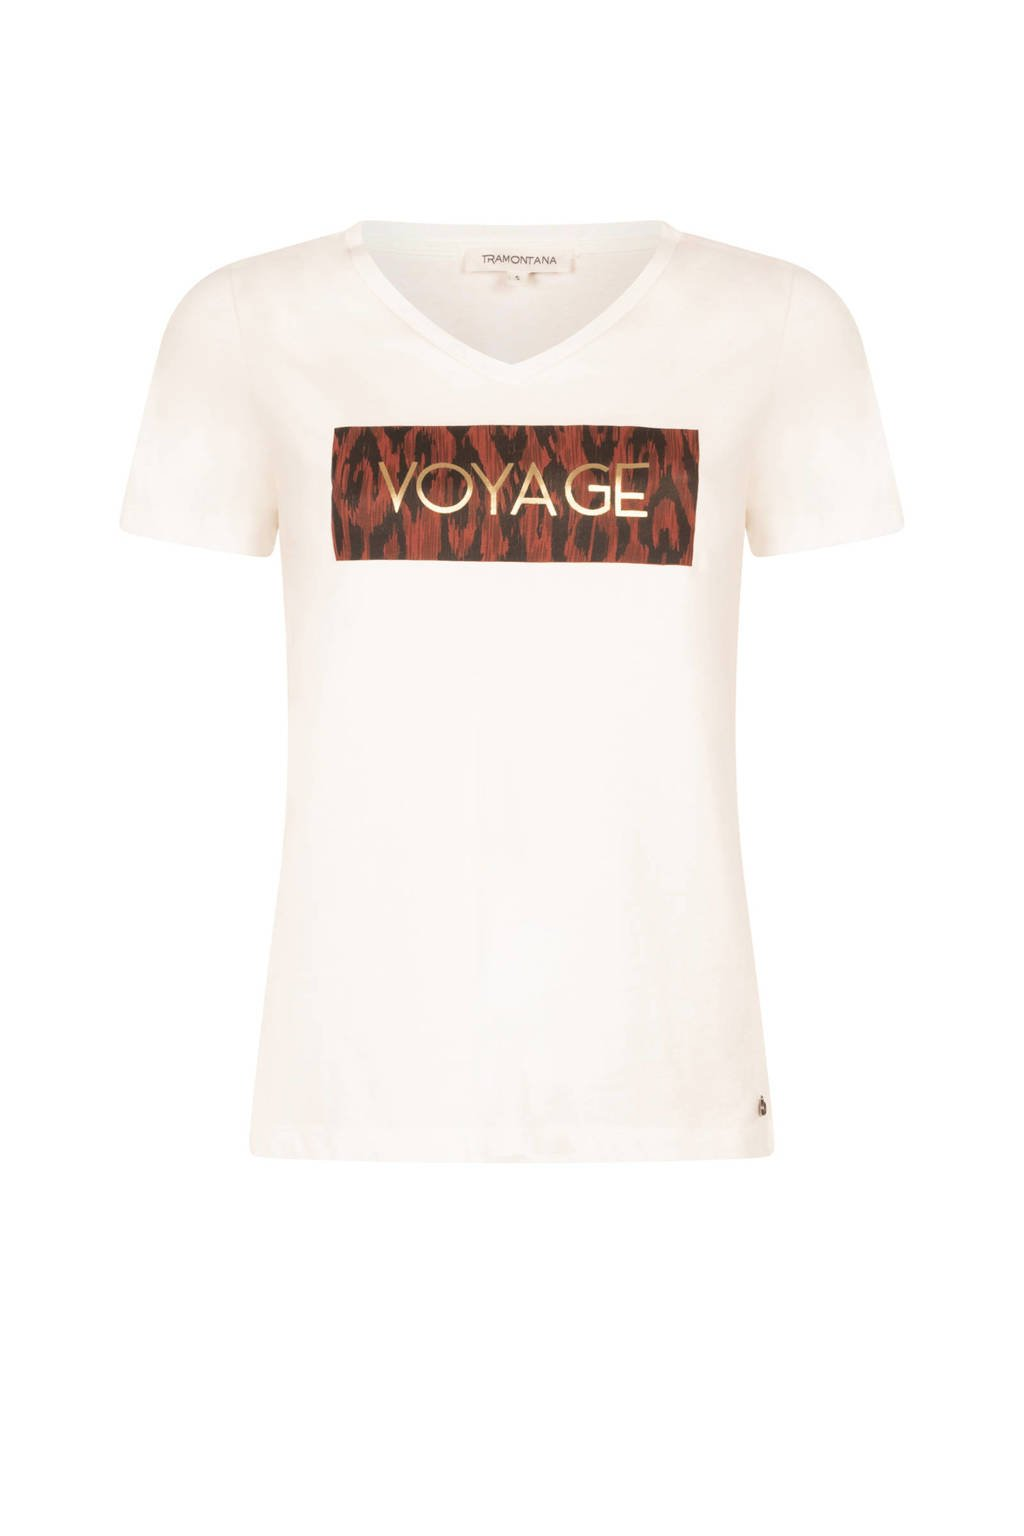 Tramontana T-shirt met printopdruk ecru, Ecru